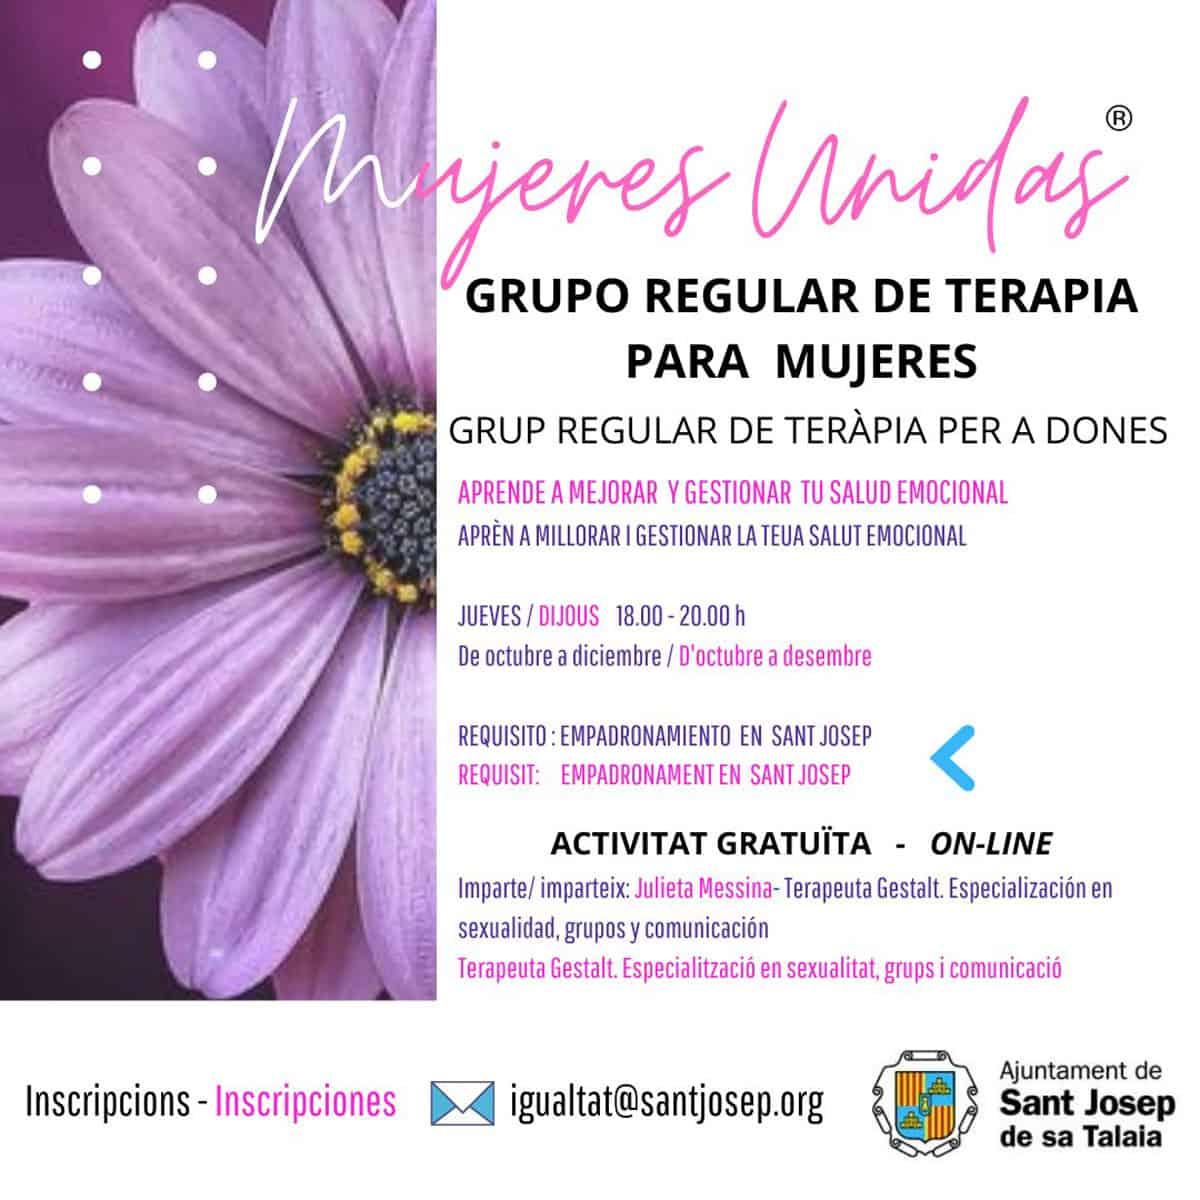 mujeres-unidas-grupo-terapeutico-mujeres-san-jose-ibiza-2020-welcometoibiza